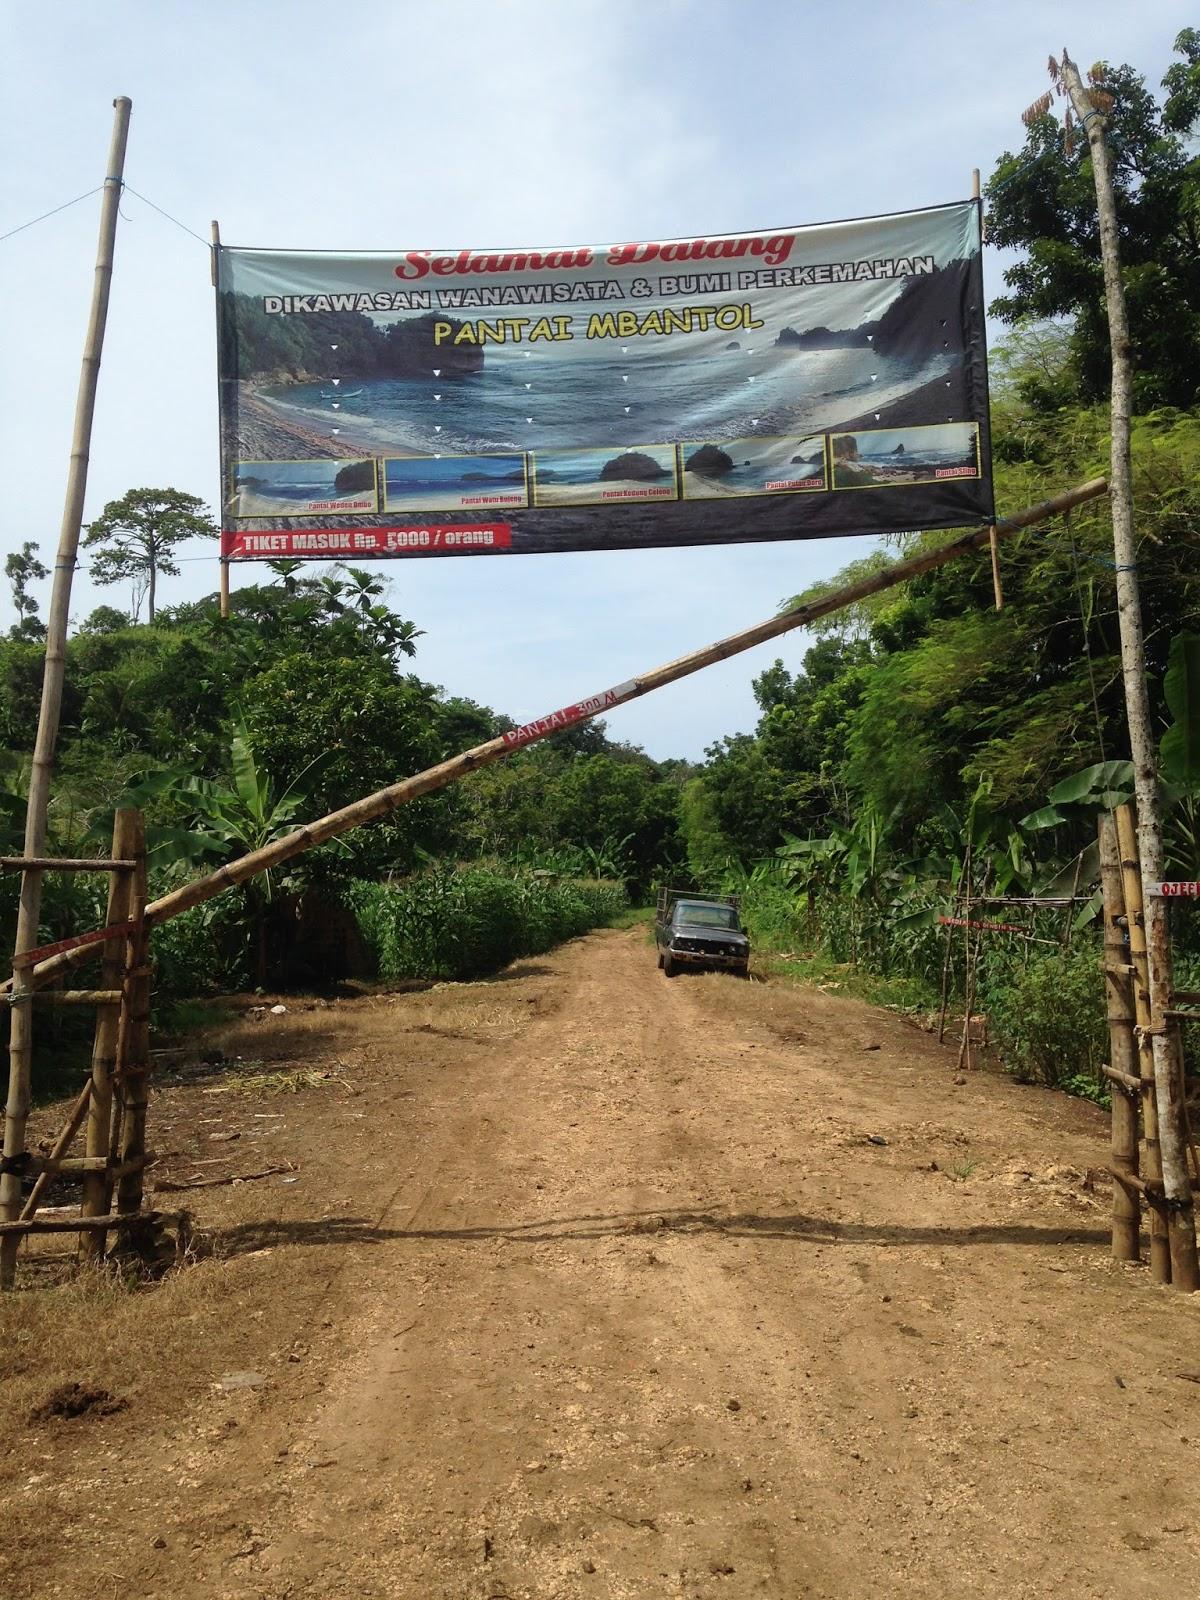 Pantai Dung Celeng Benthol Seling Pulodoro Malang Muhammad Benarlah Kita